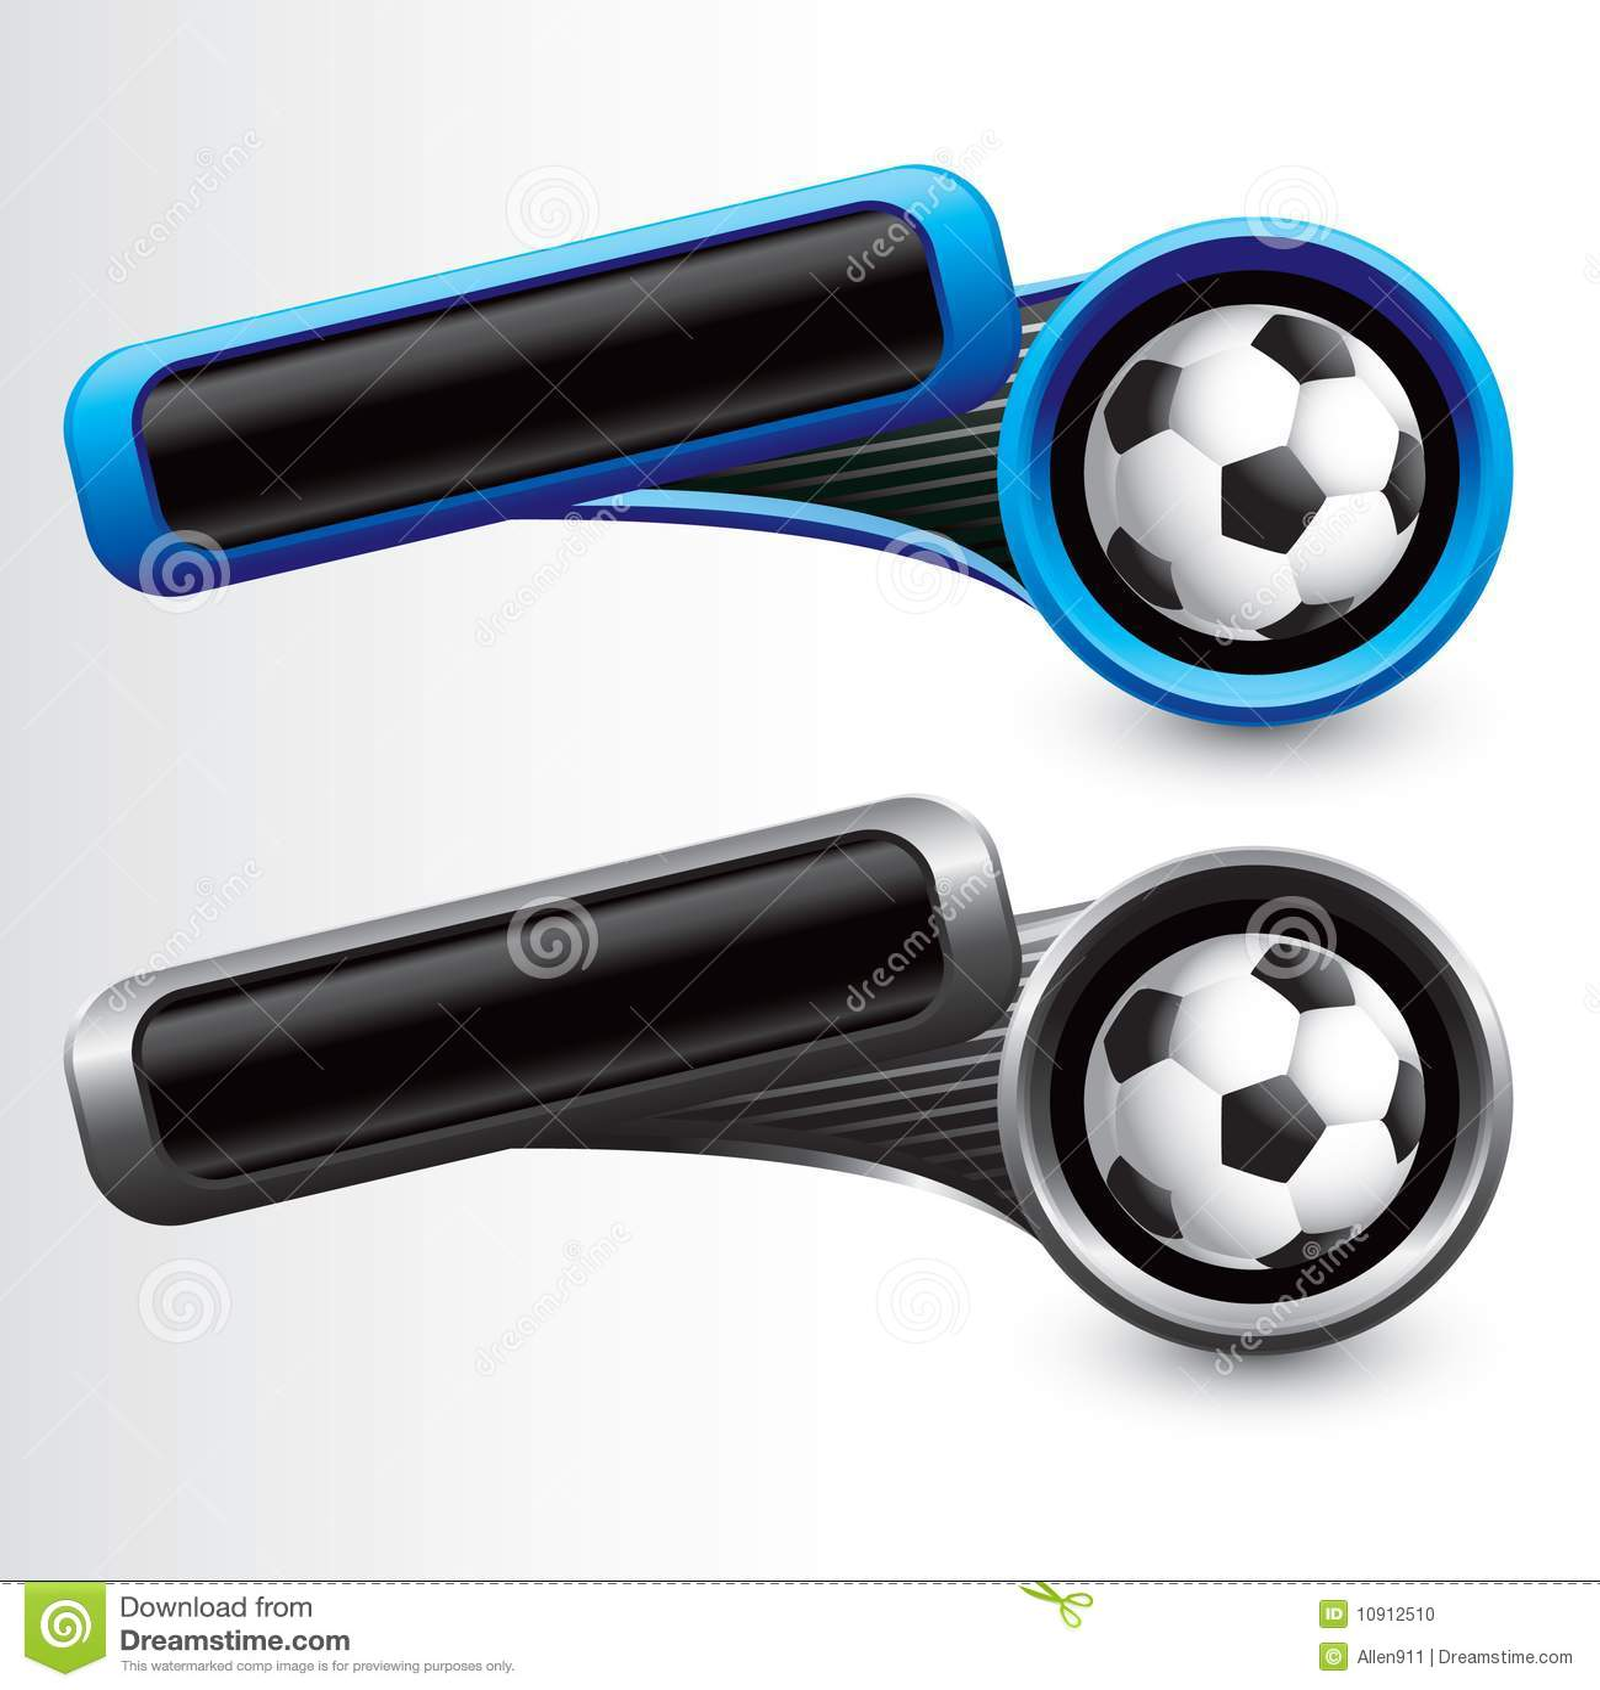 Foot massage vibrator